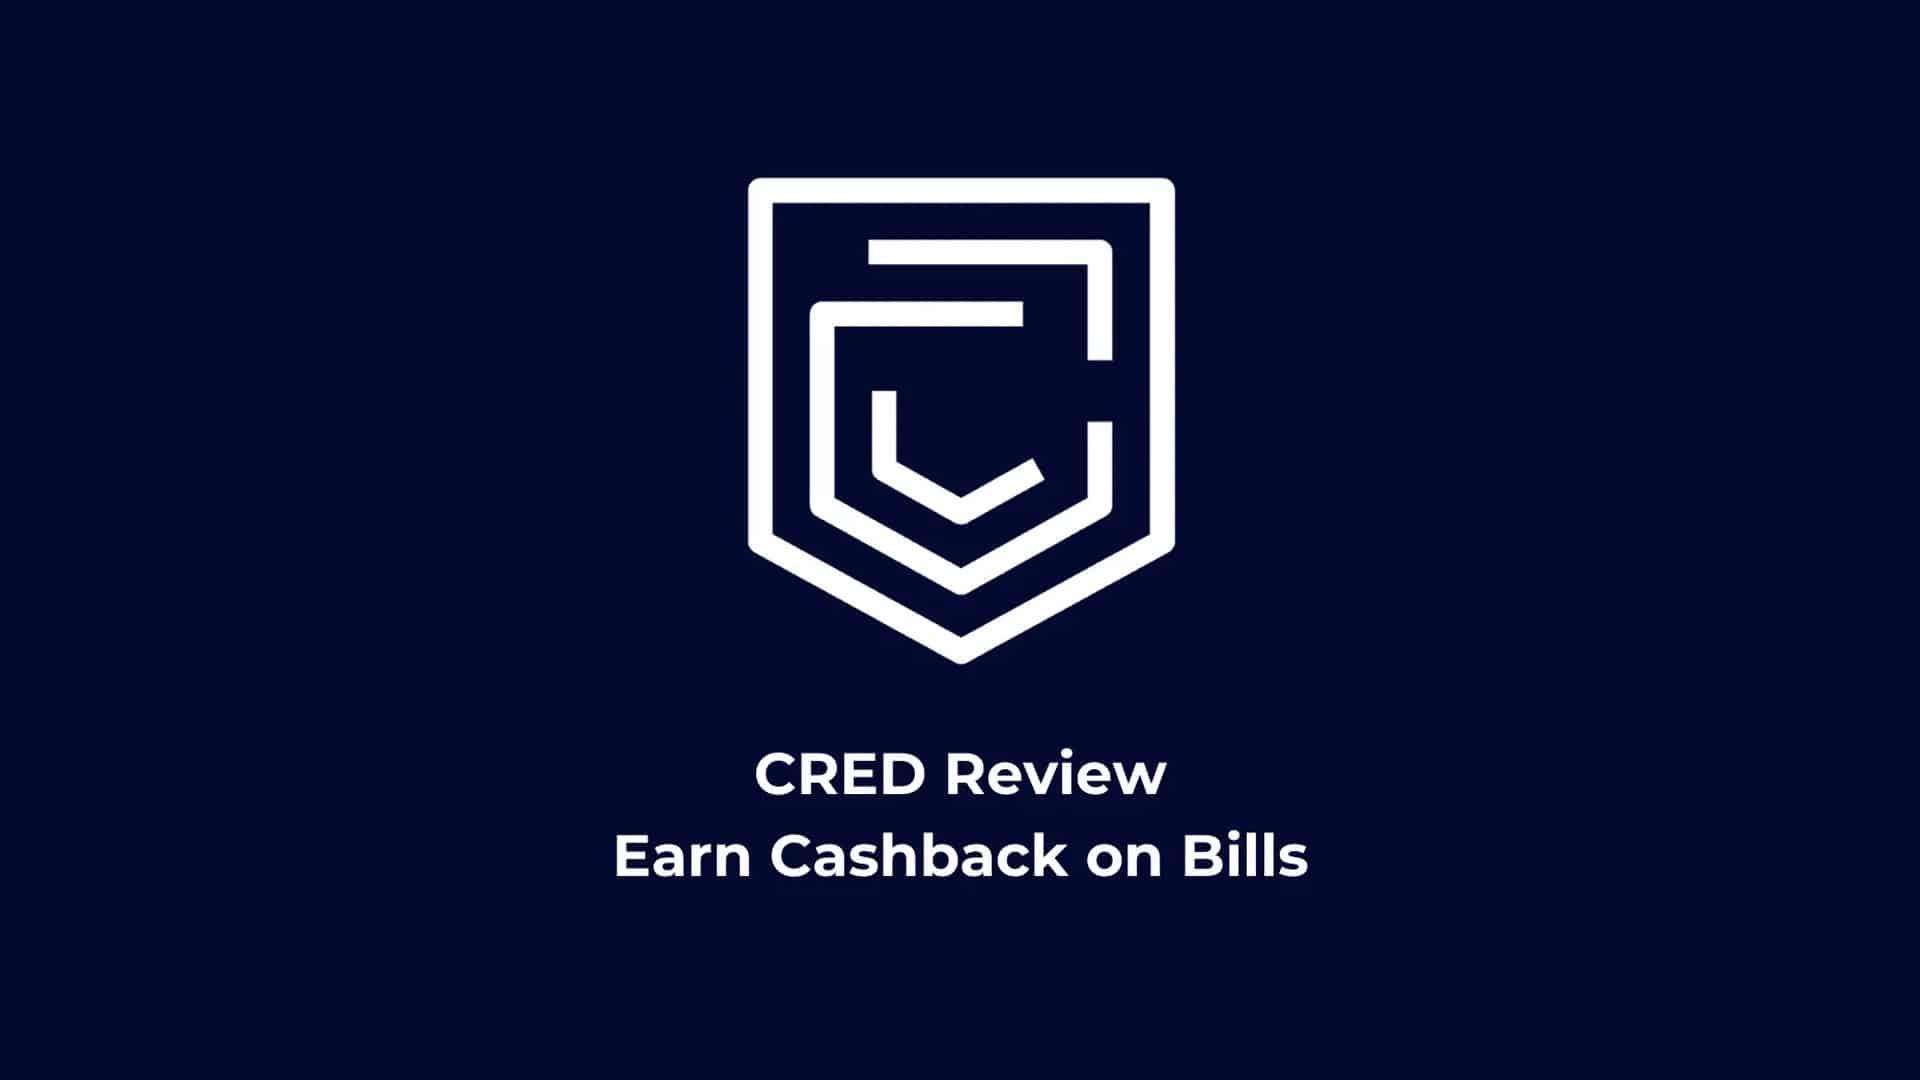 Cred raises USD 81 mn funding, undertakes USD 1.2 mn Esop buyback plan